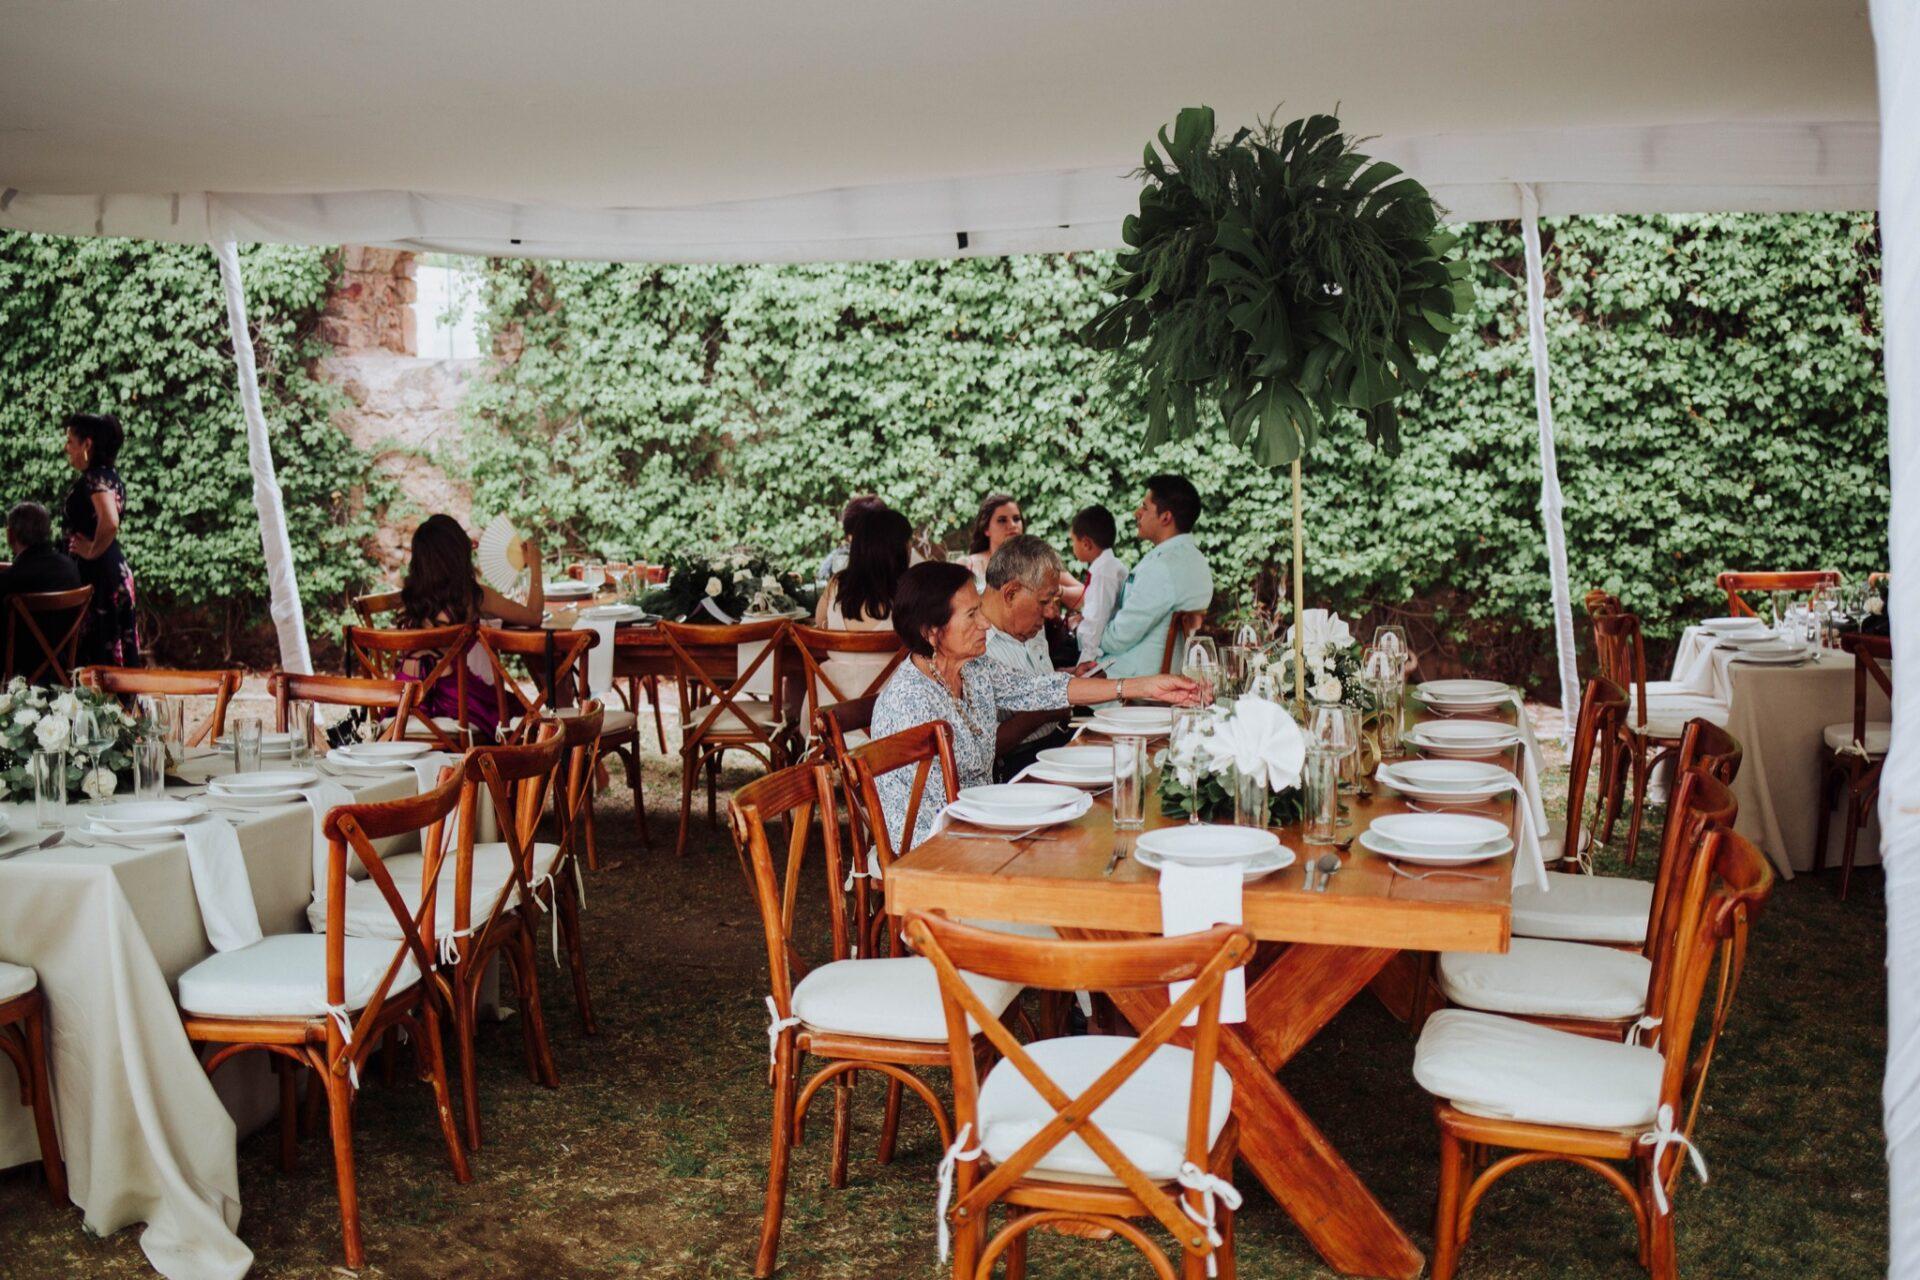 javier_noriega_fotografo_bodas_centro_platero_zacatecas_wedding_photographer23